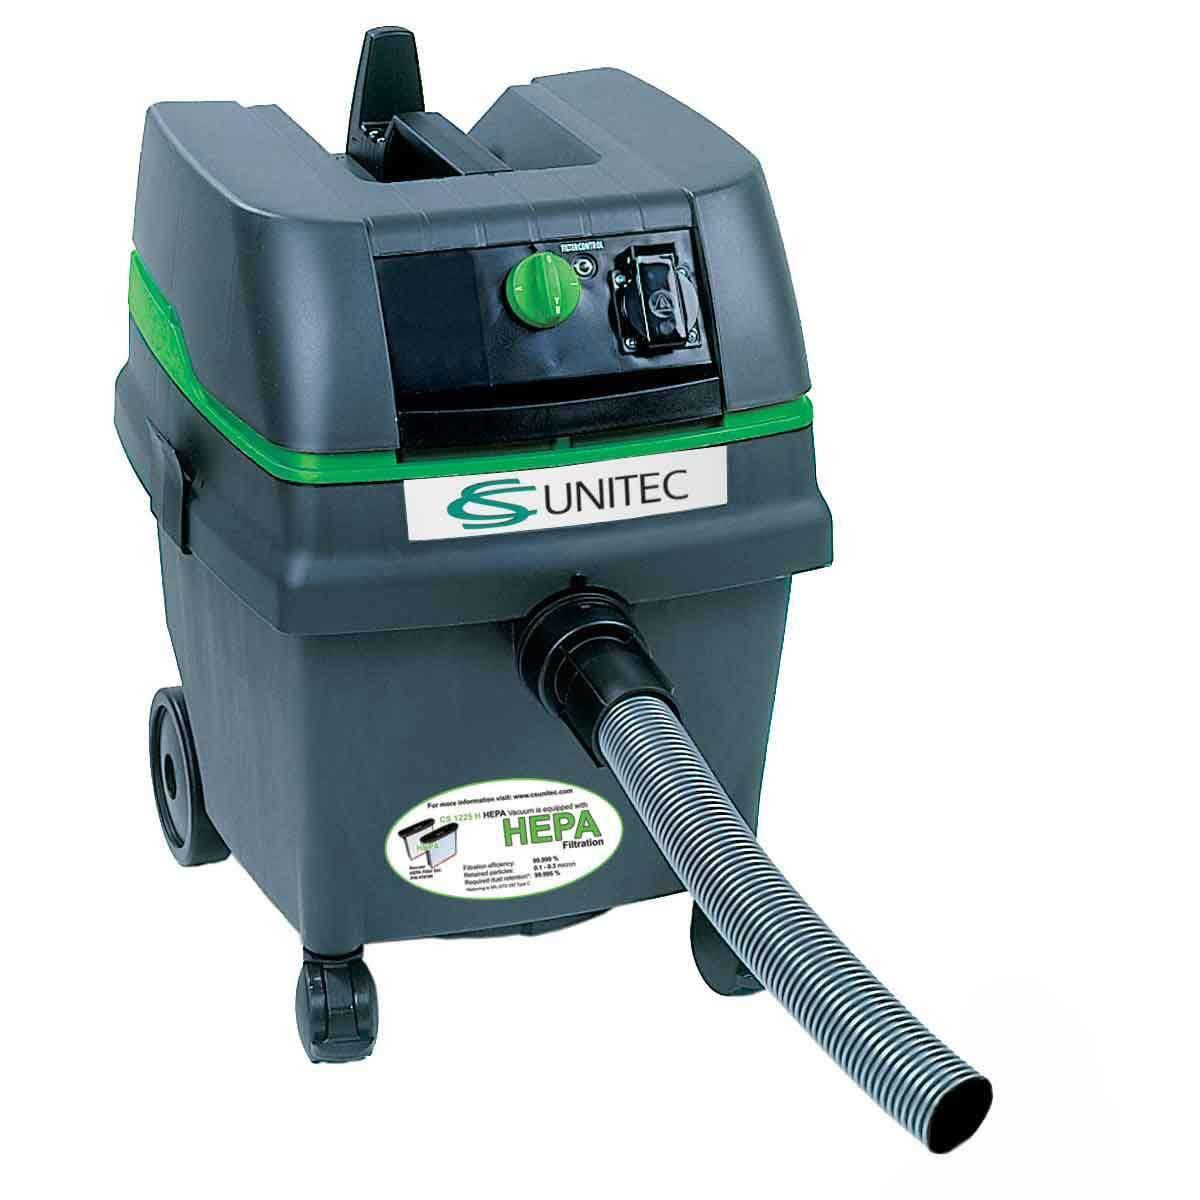 CS1225H CS Untiec Hepa Wet/Dry Vacuum